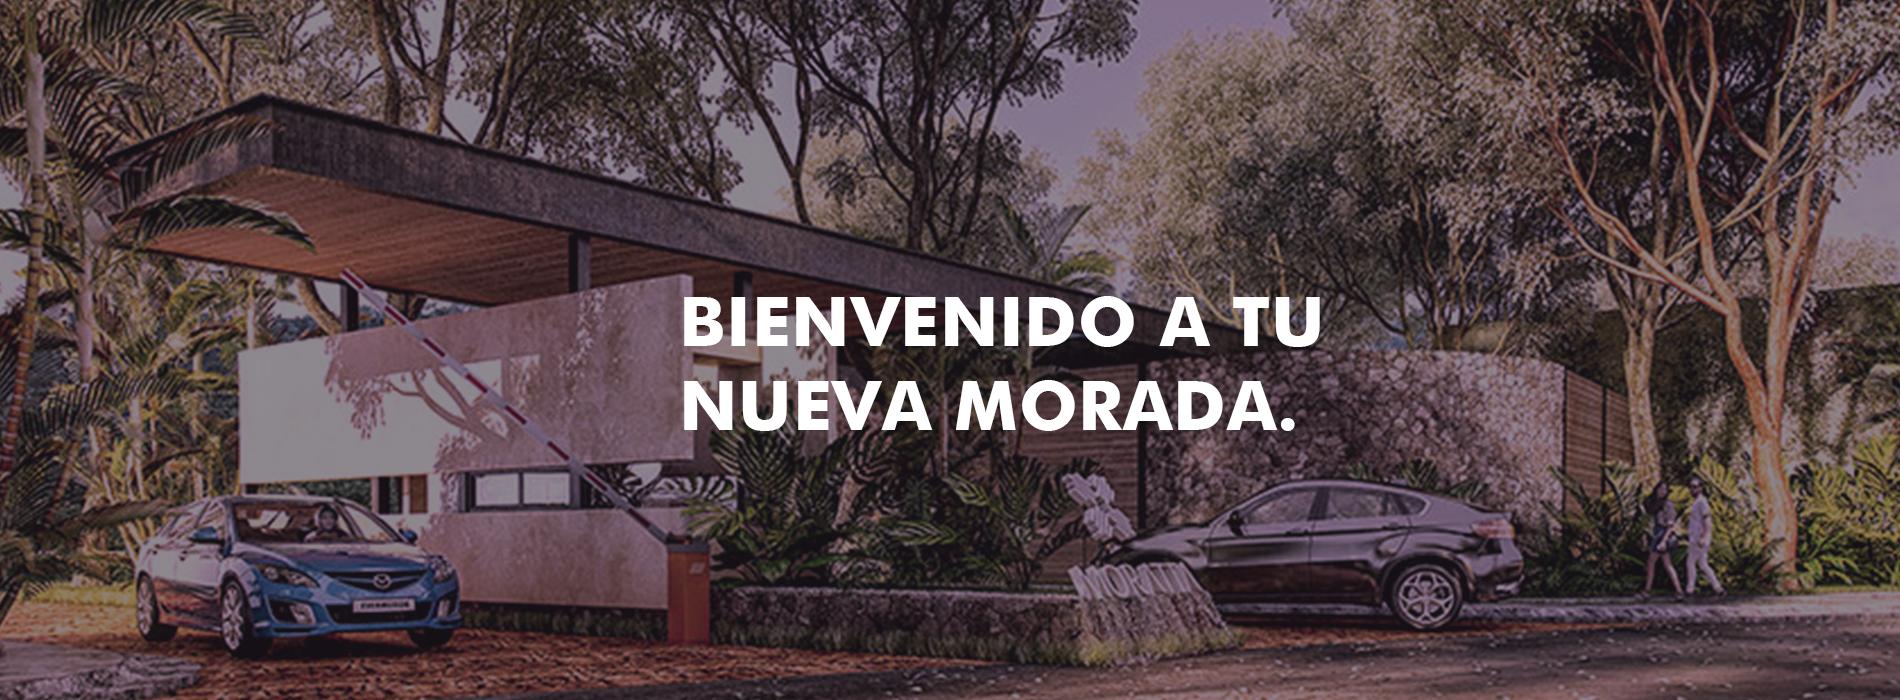 Casas Venta Mérida Moratta Goodlers